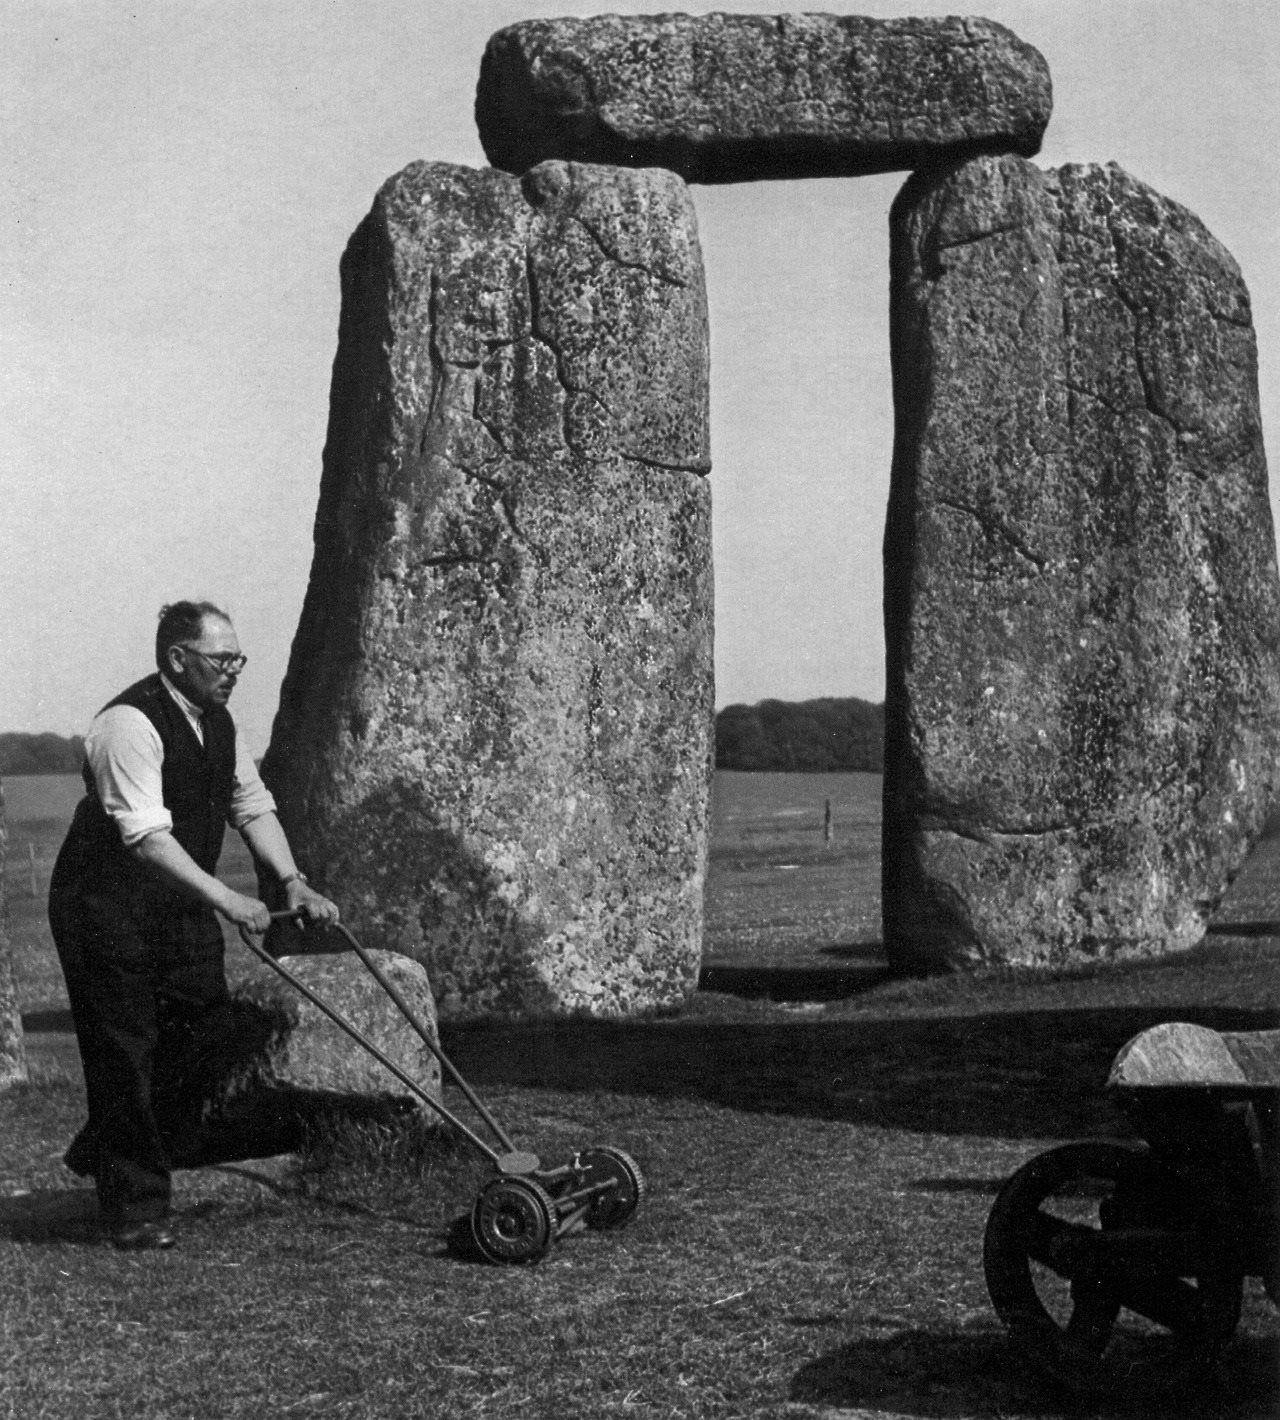 Mowing Stonehenge, ca. 1950